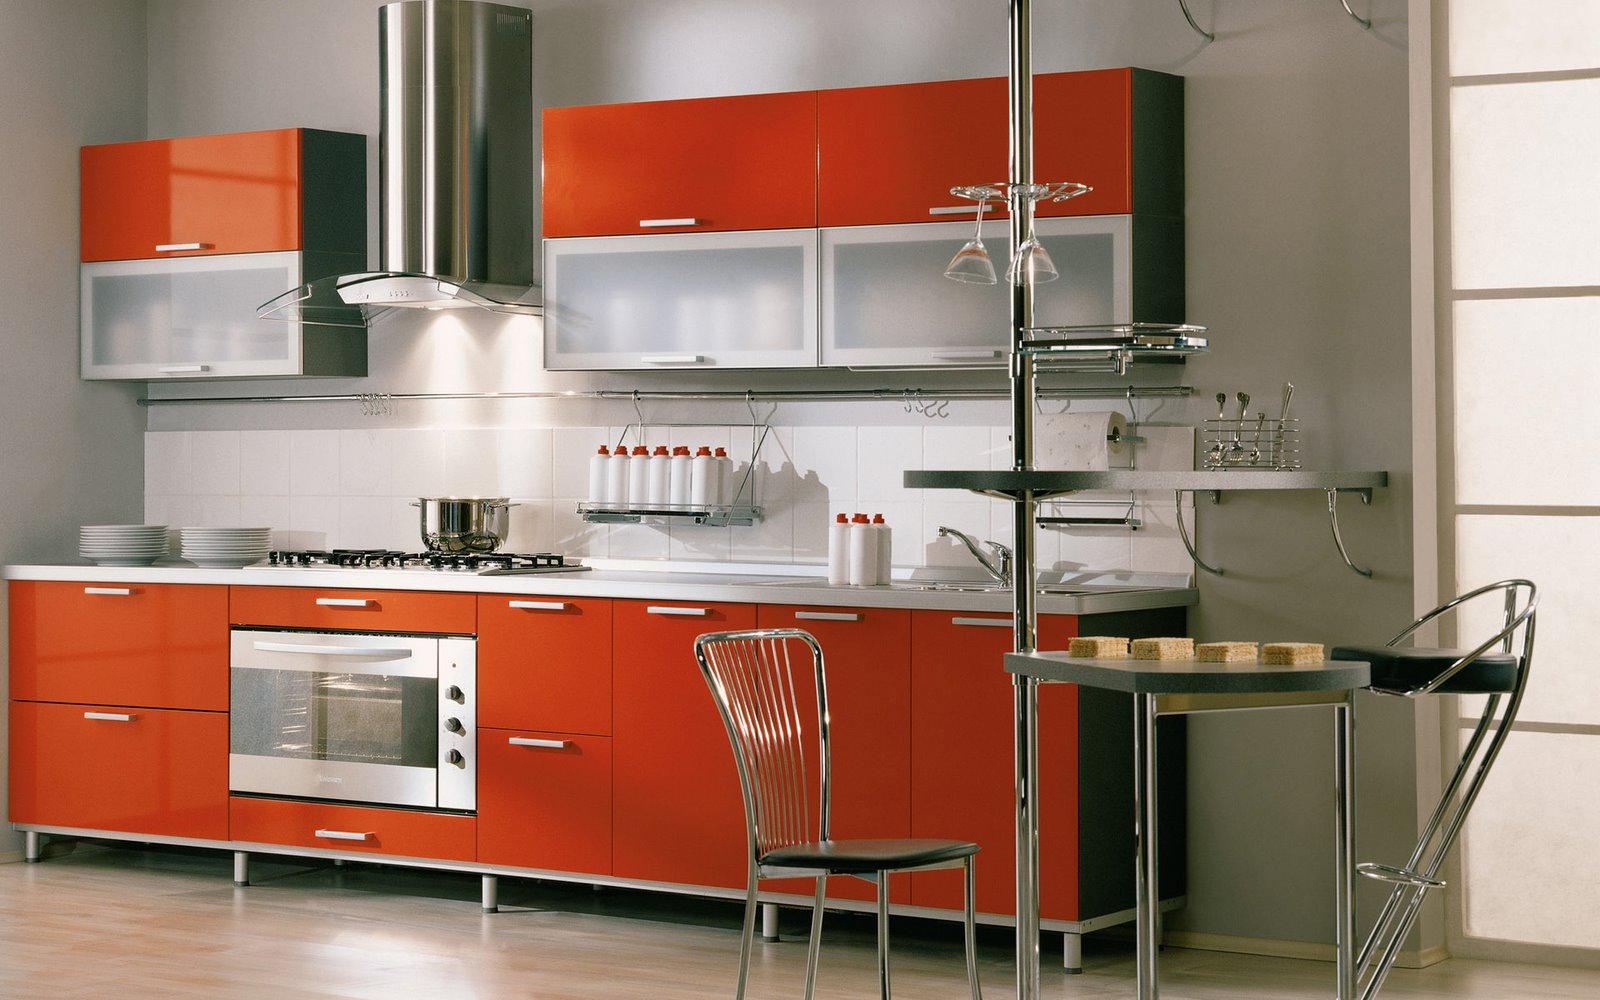 Tall kitchen wall cabinets Photo - 3